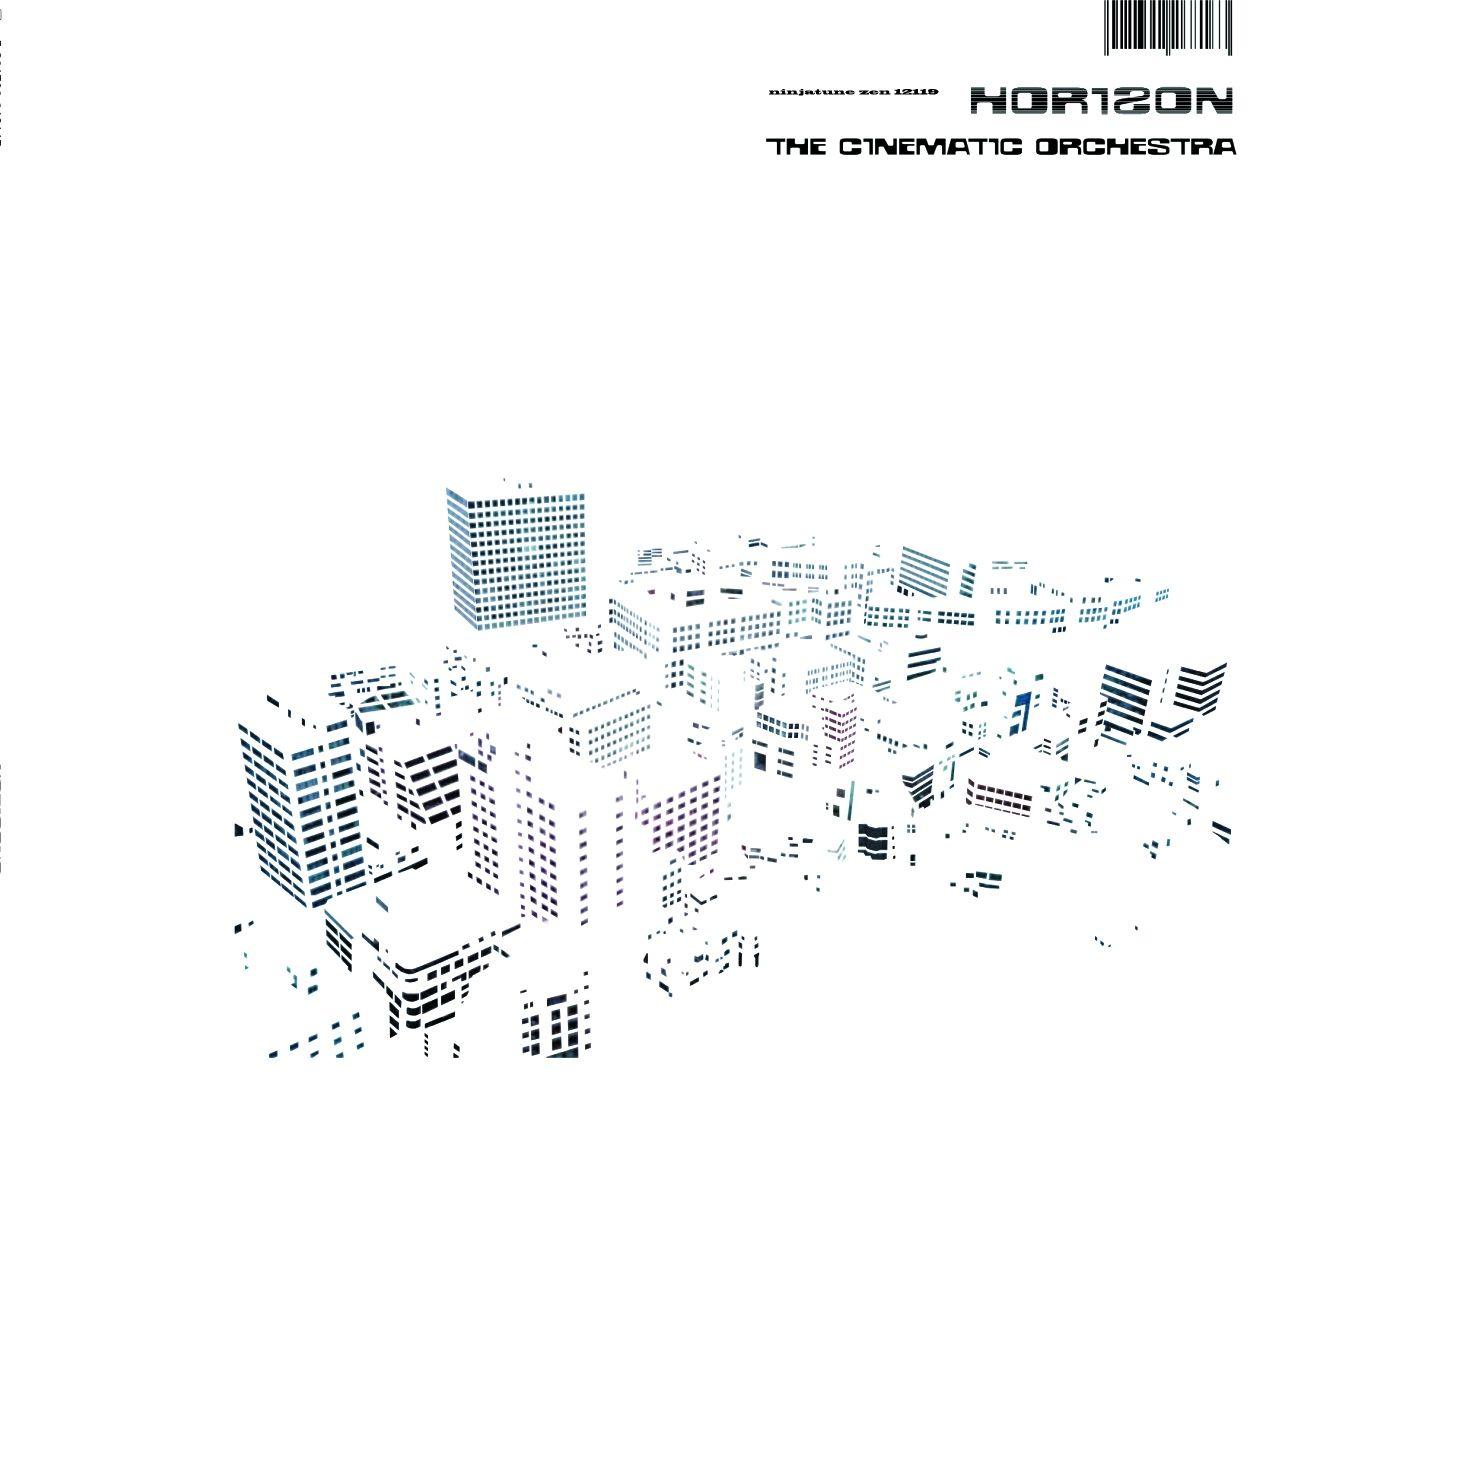 cool album graphics from cinematic orchestra album name is horizon